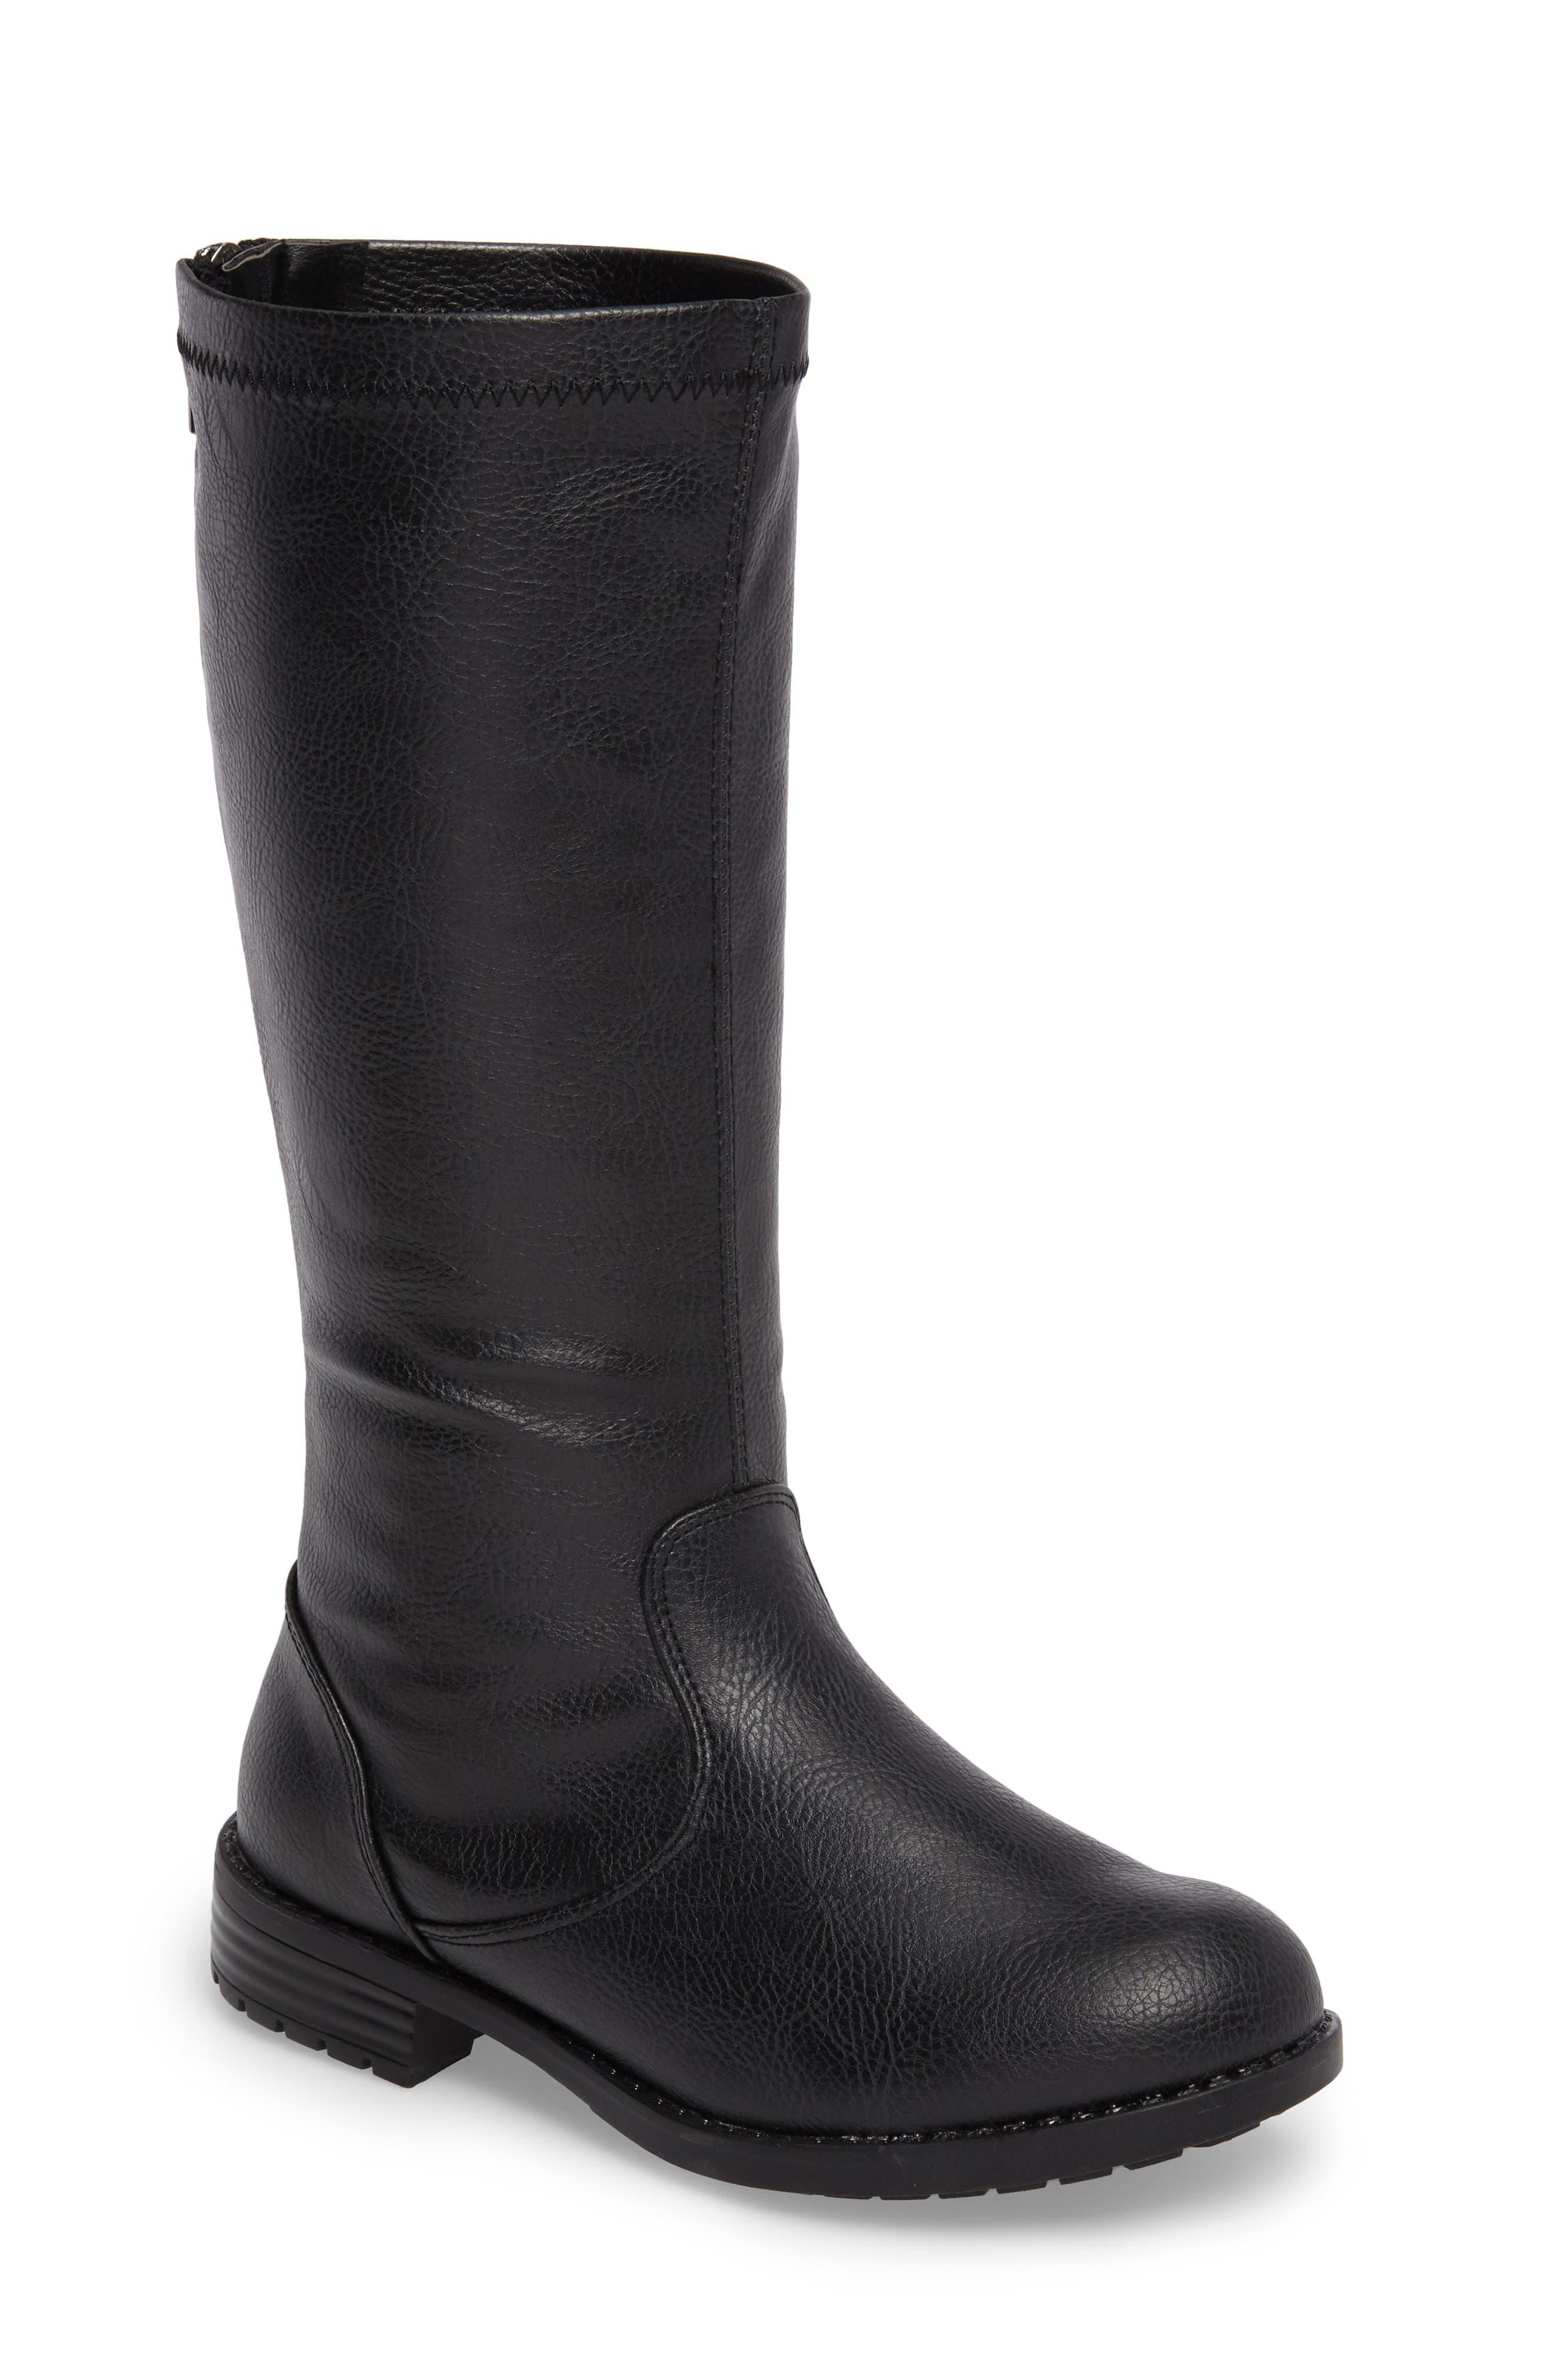 Kenneth Cole New York Autumn Stretch Boot (Walker, Toddler, Little Kid & Big Kid)